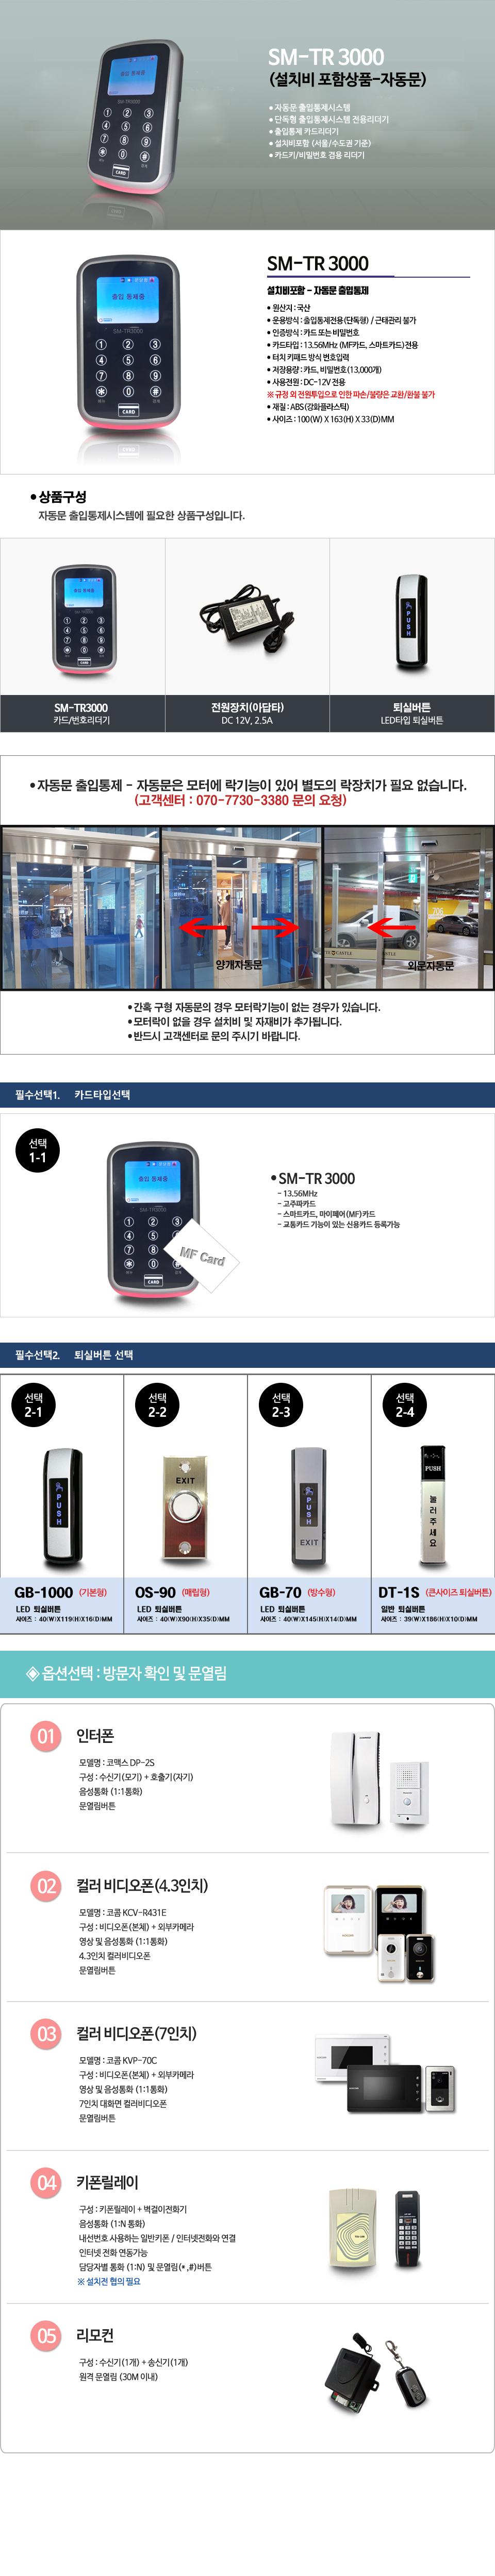 SM-TR3000설치비포함작업-자동문.jpg